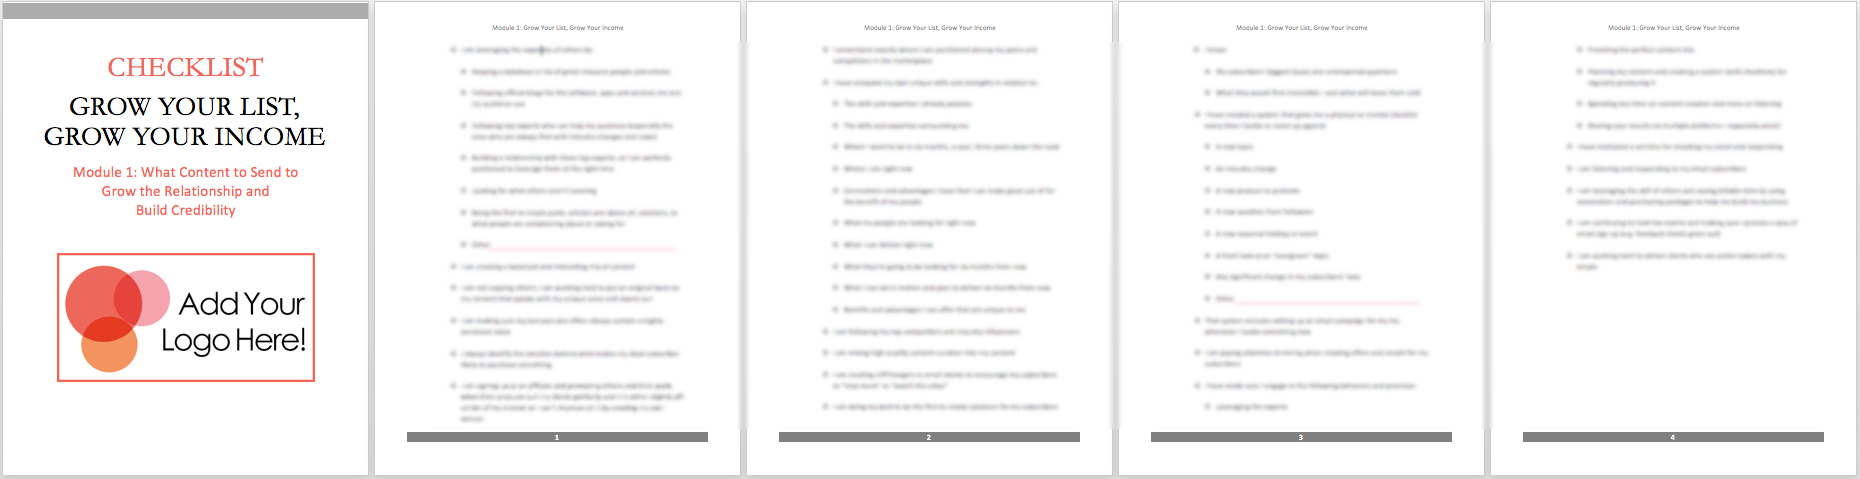 mod 1 checklist